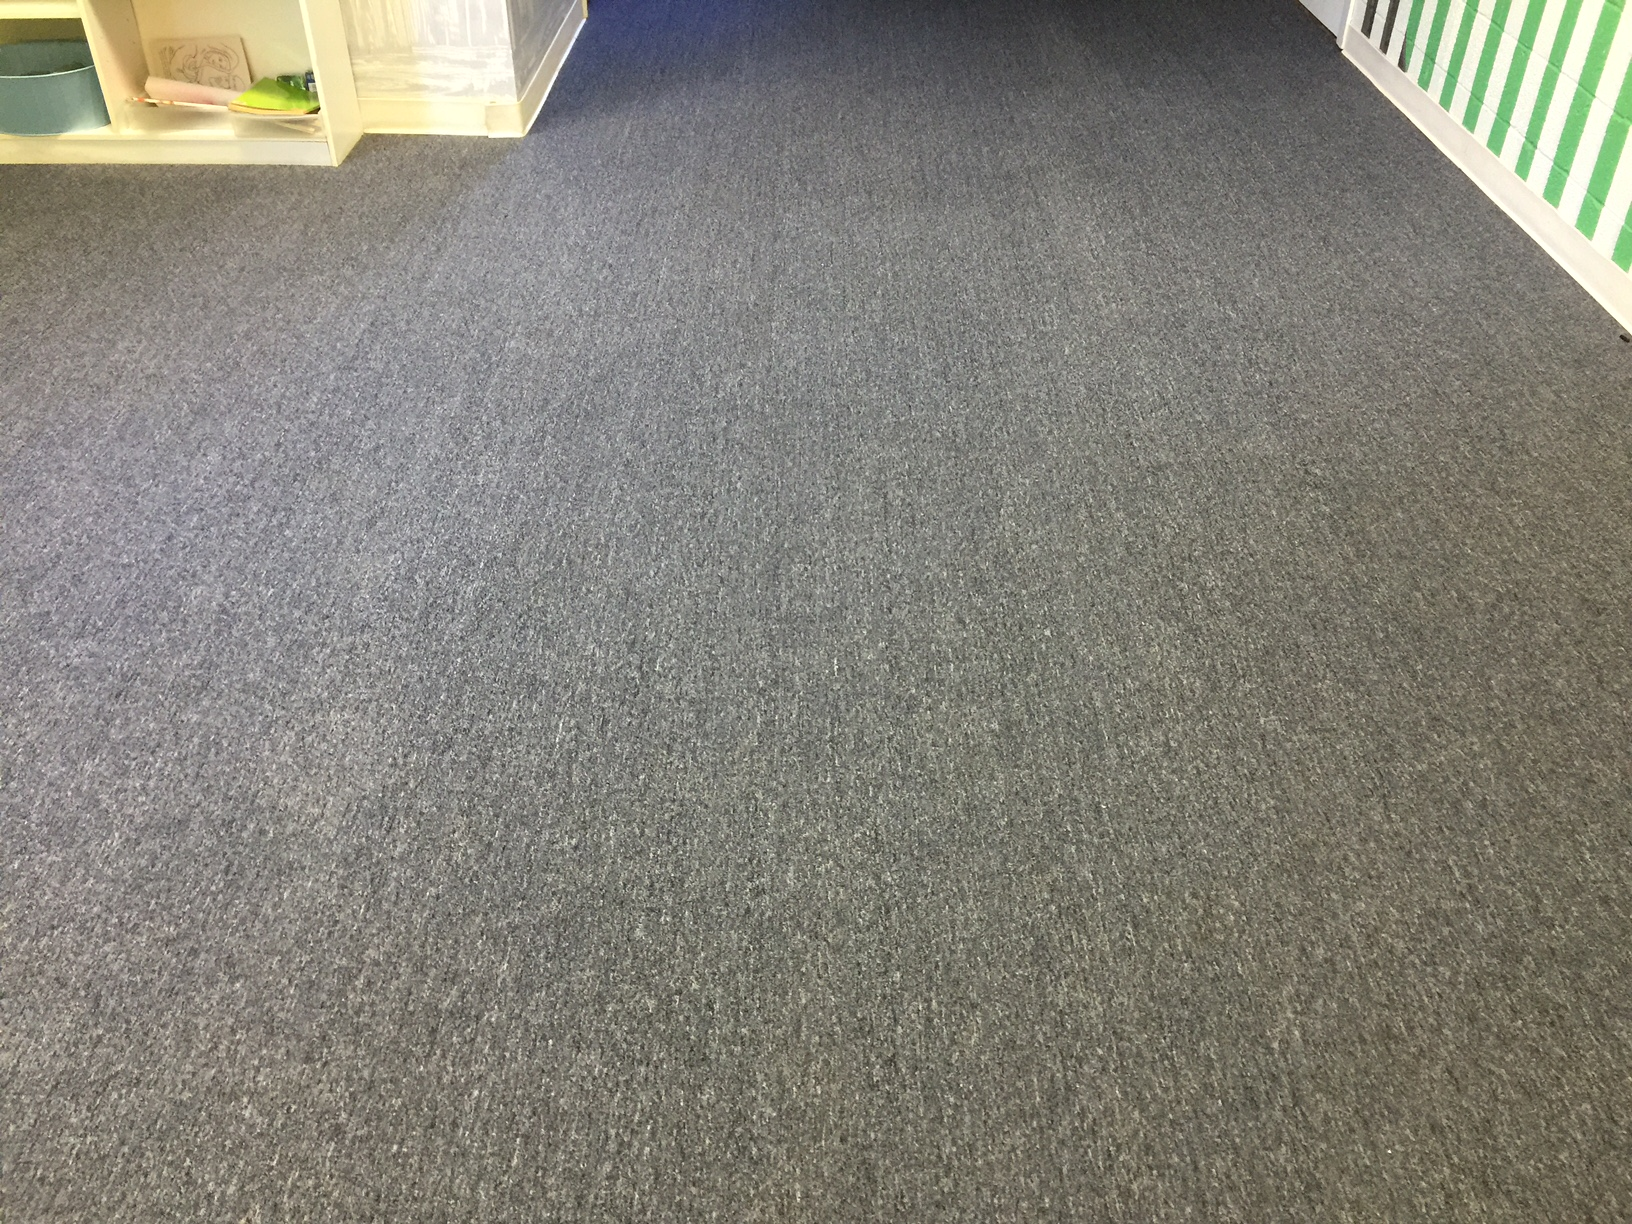 Simply Clean Carpet Care image 8